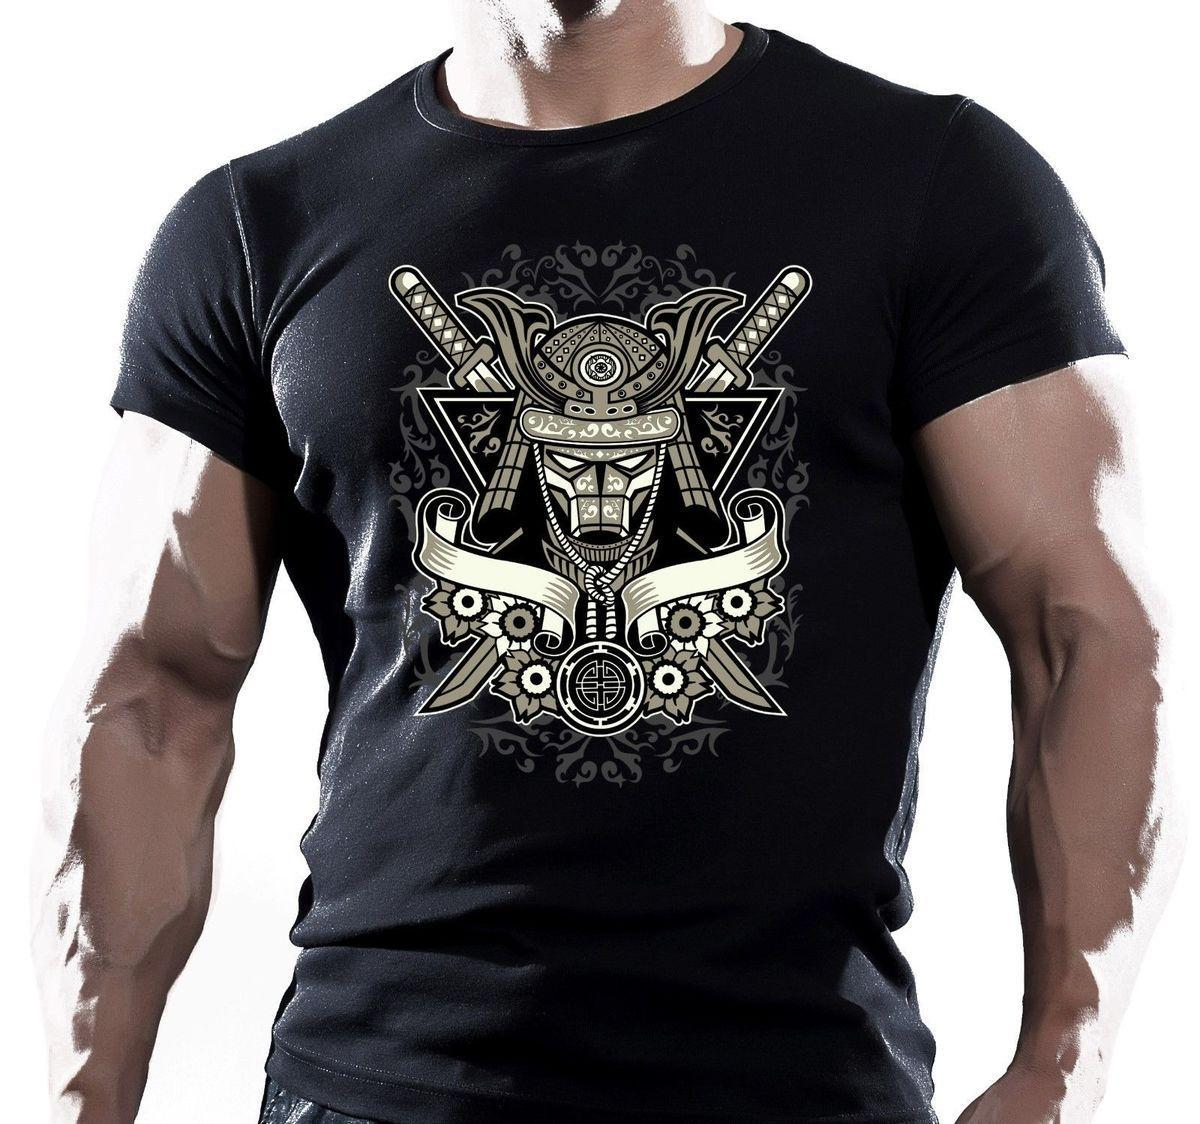 Japan Assassin Shogun T Shirt Design Your Own Shirt Samurai King